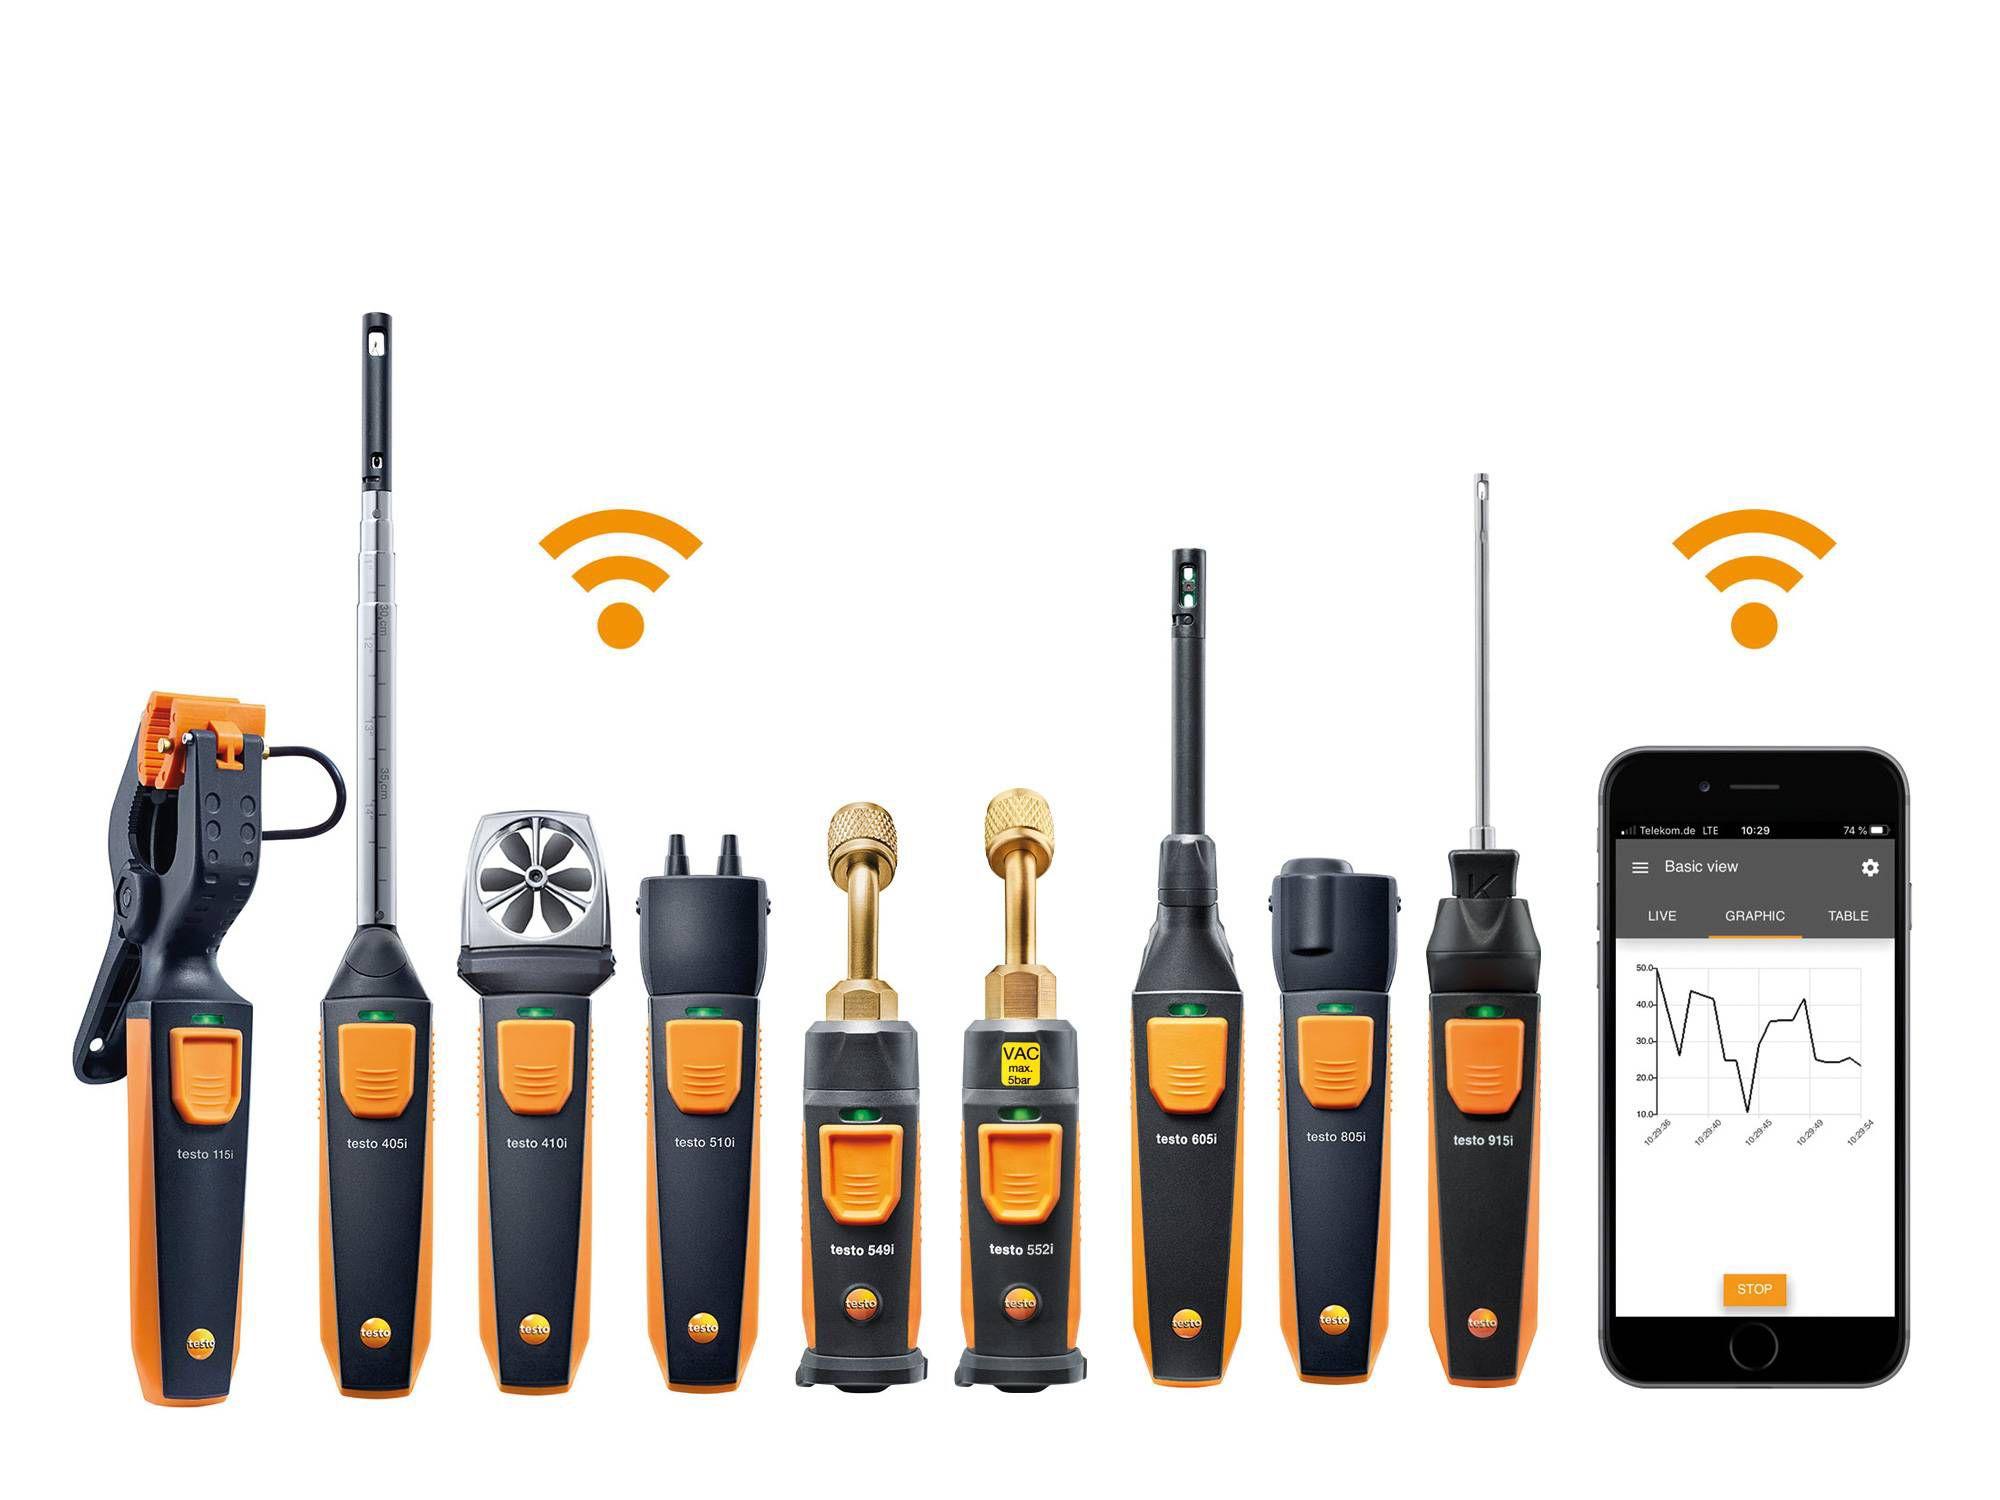 POP-Smart-Probes-Range-2020-2000x1500.jpg